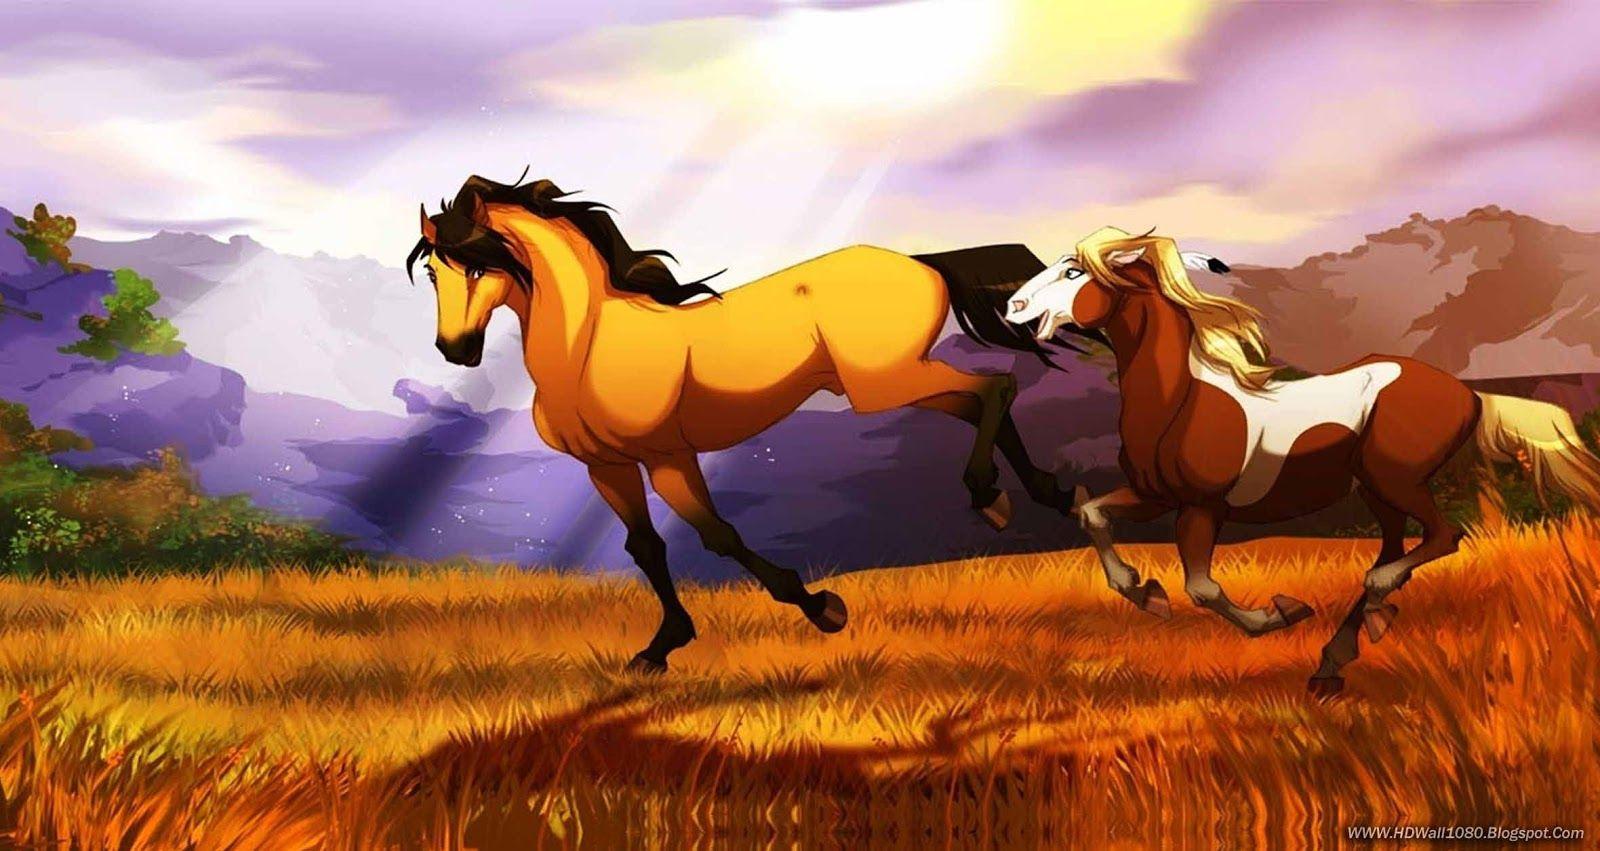 Must see Wallpaper Horse Spirit - c58d6d90869fe65f5e20c943475f36fe  HD_879888.jpg